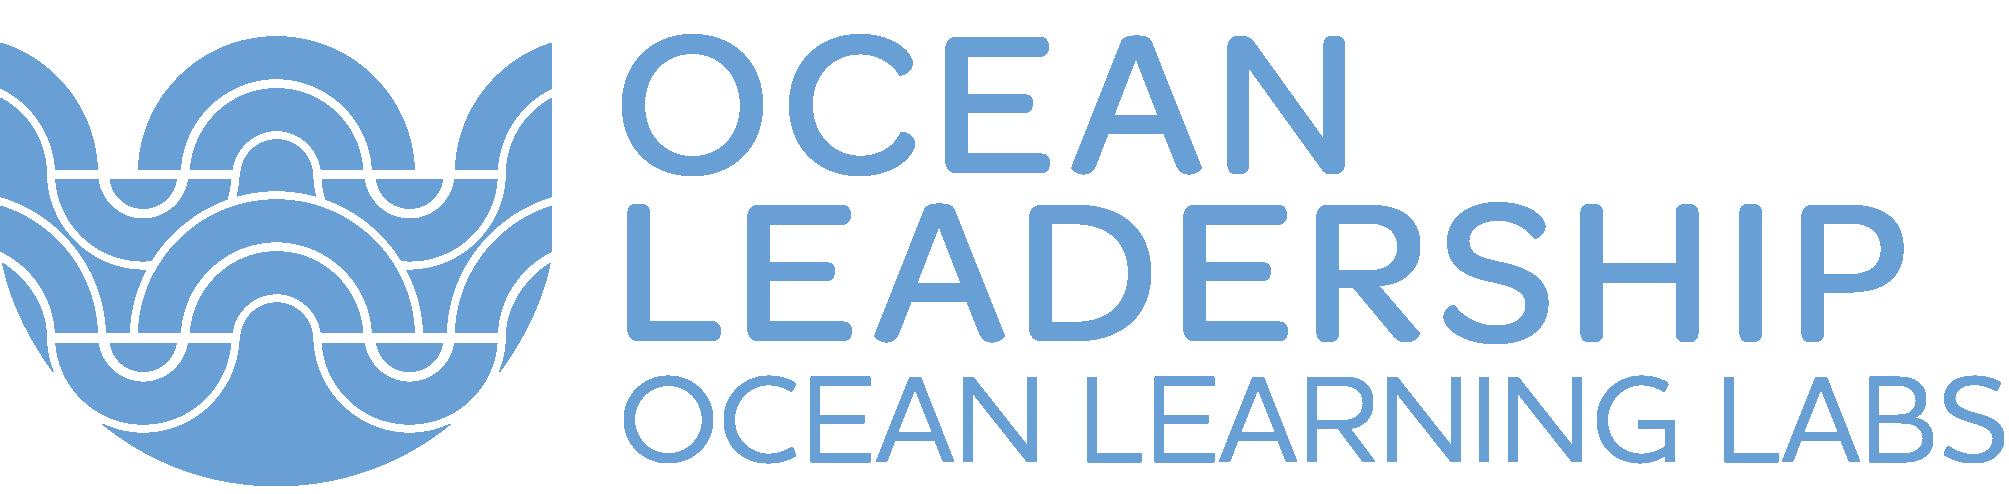 OceanLearningLabsLogoSubText (1)